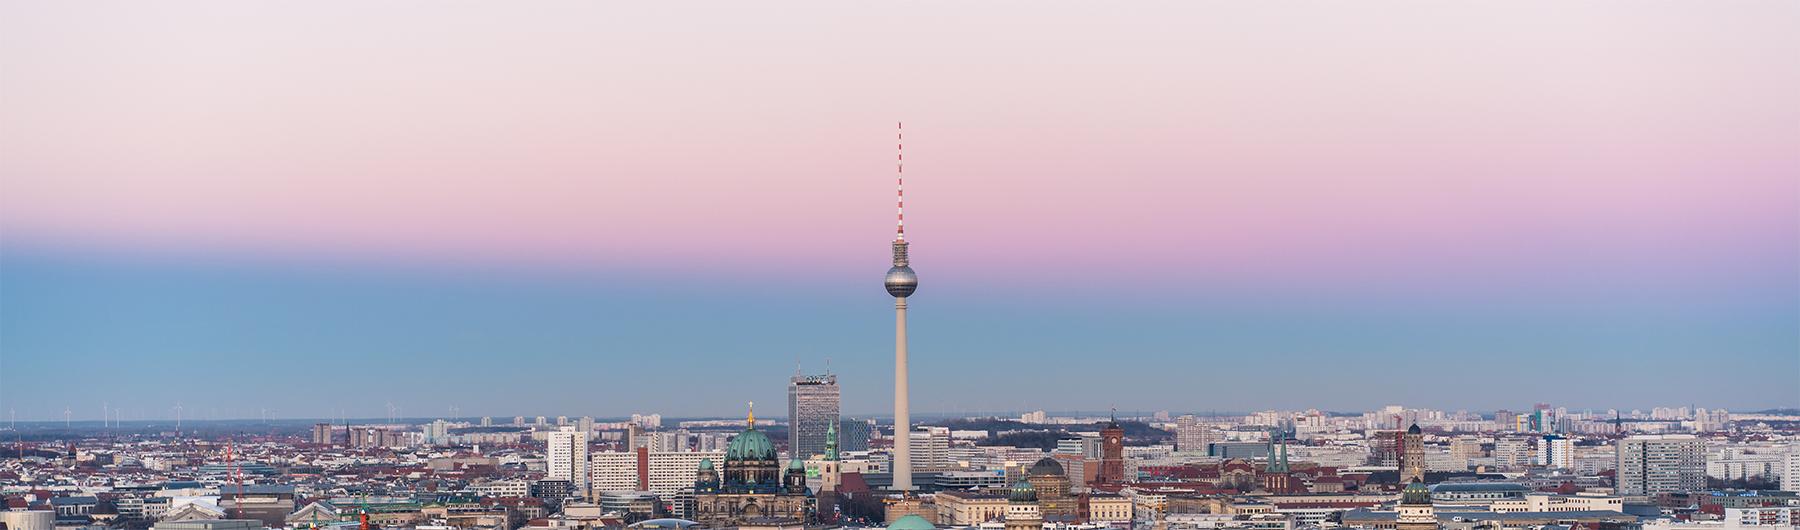 Maintainerati Berlin 2019